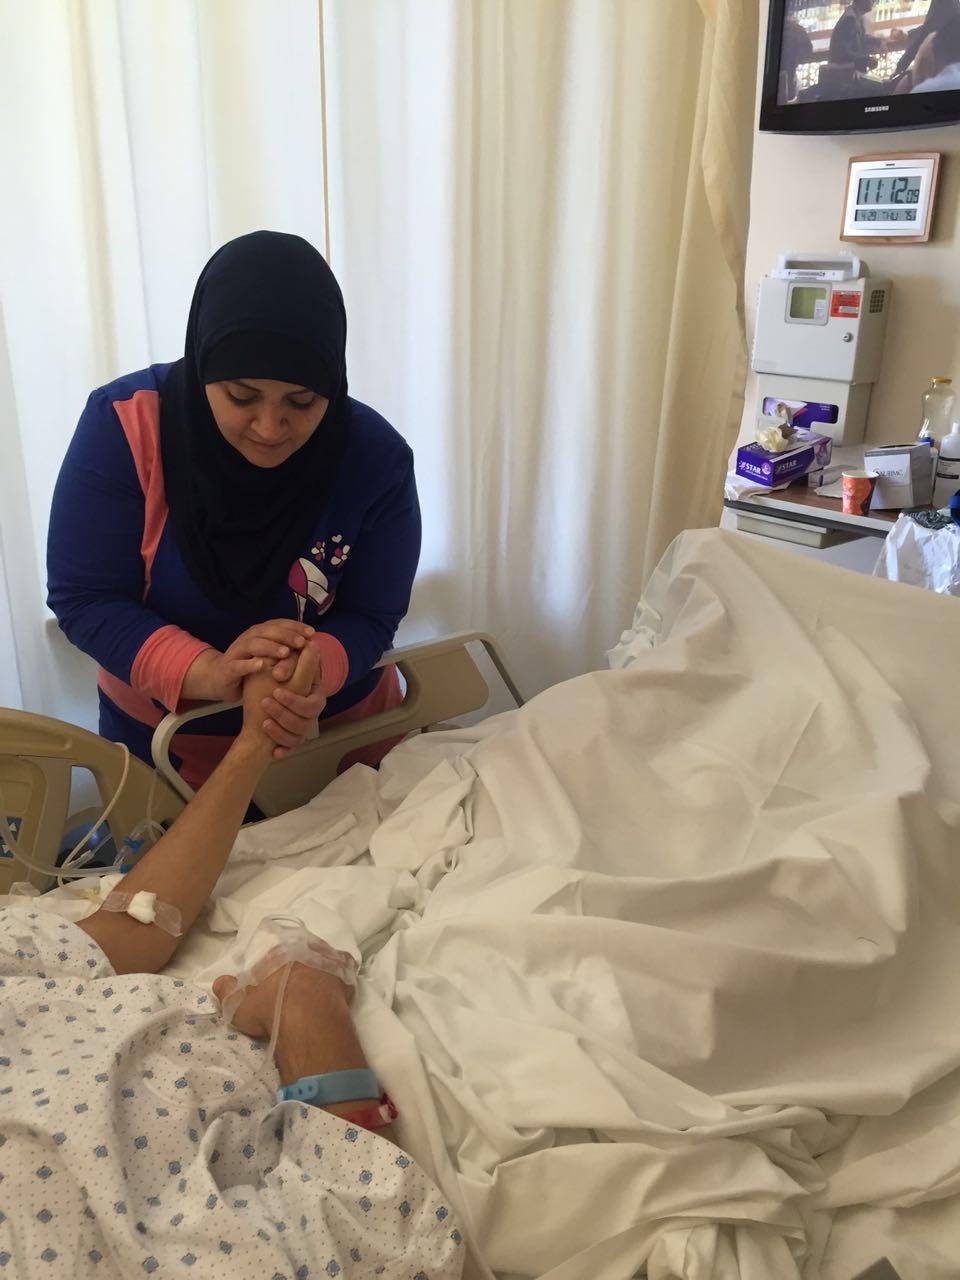 INARA Joud's mother Arwa Damon Syria